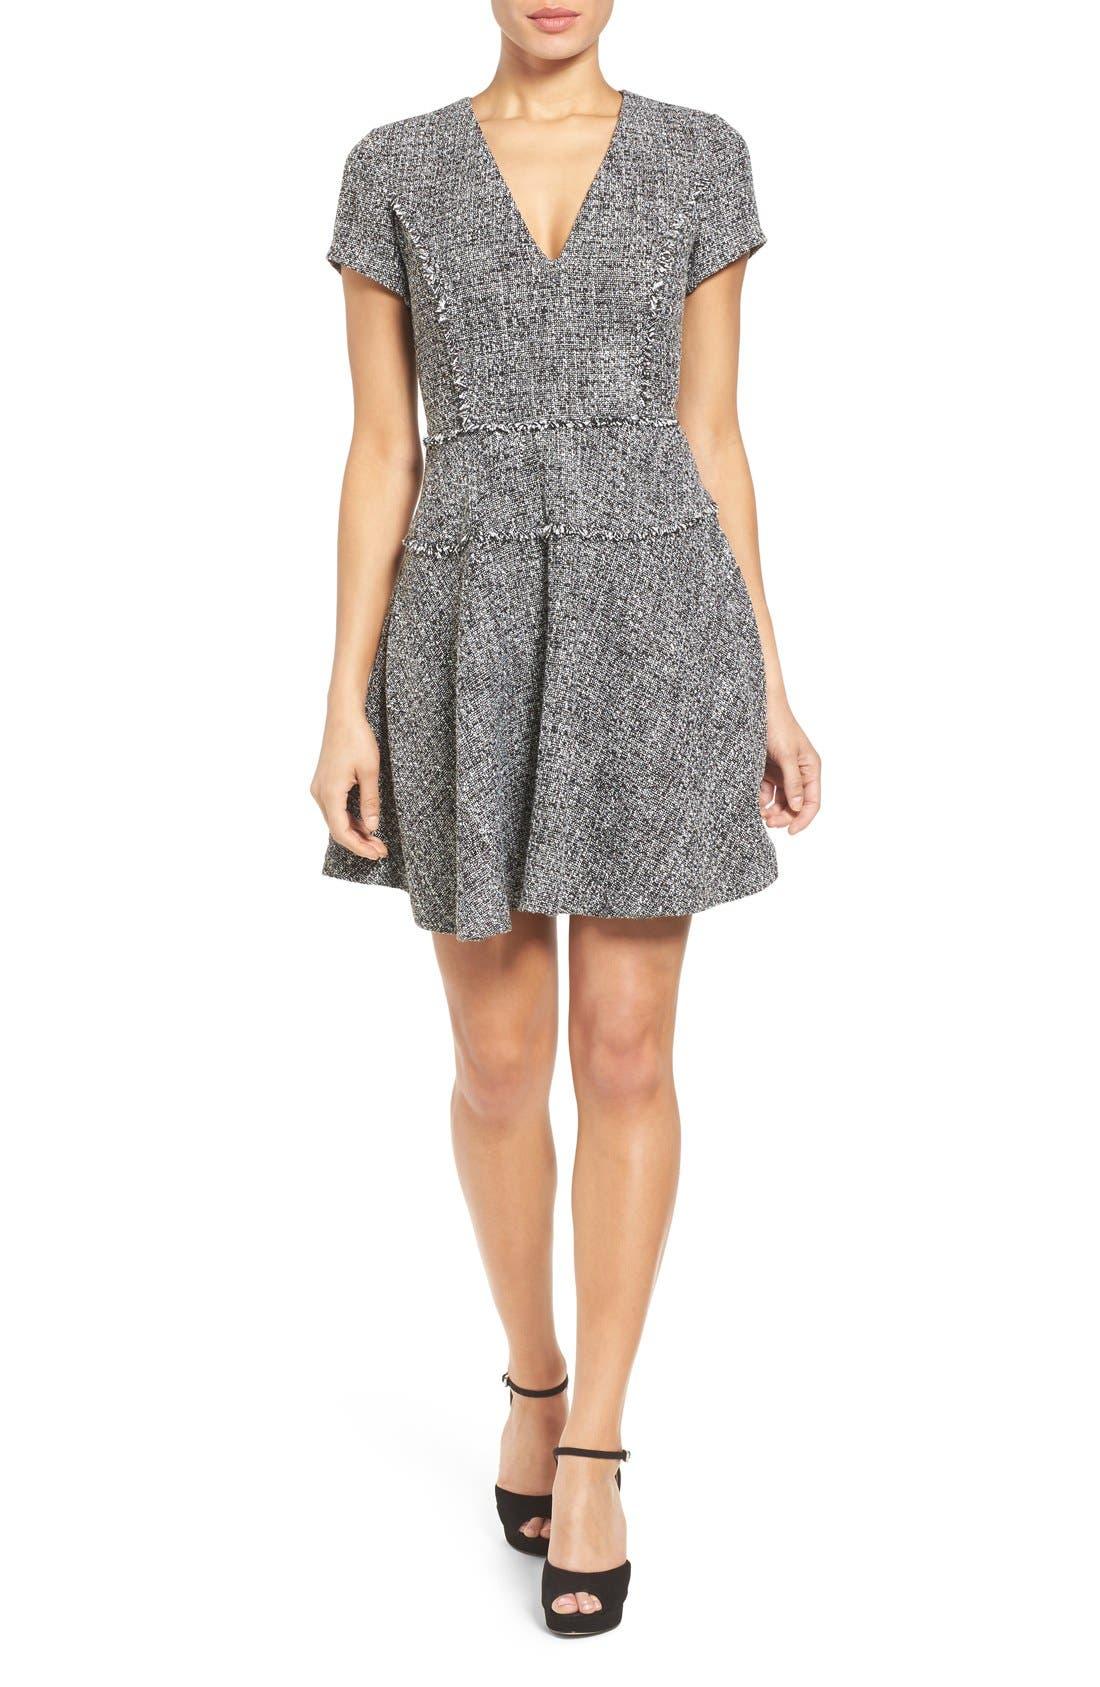 MICHAEL MICHAEL KORS,                             Tweed Fit & Flare Dress,                             Main thumbnail 1, color,                             001